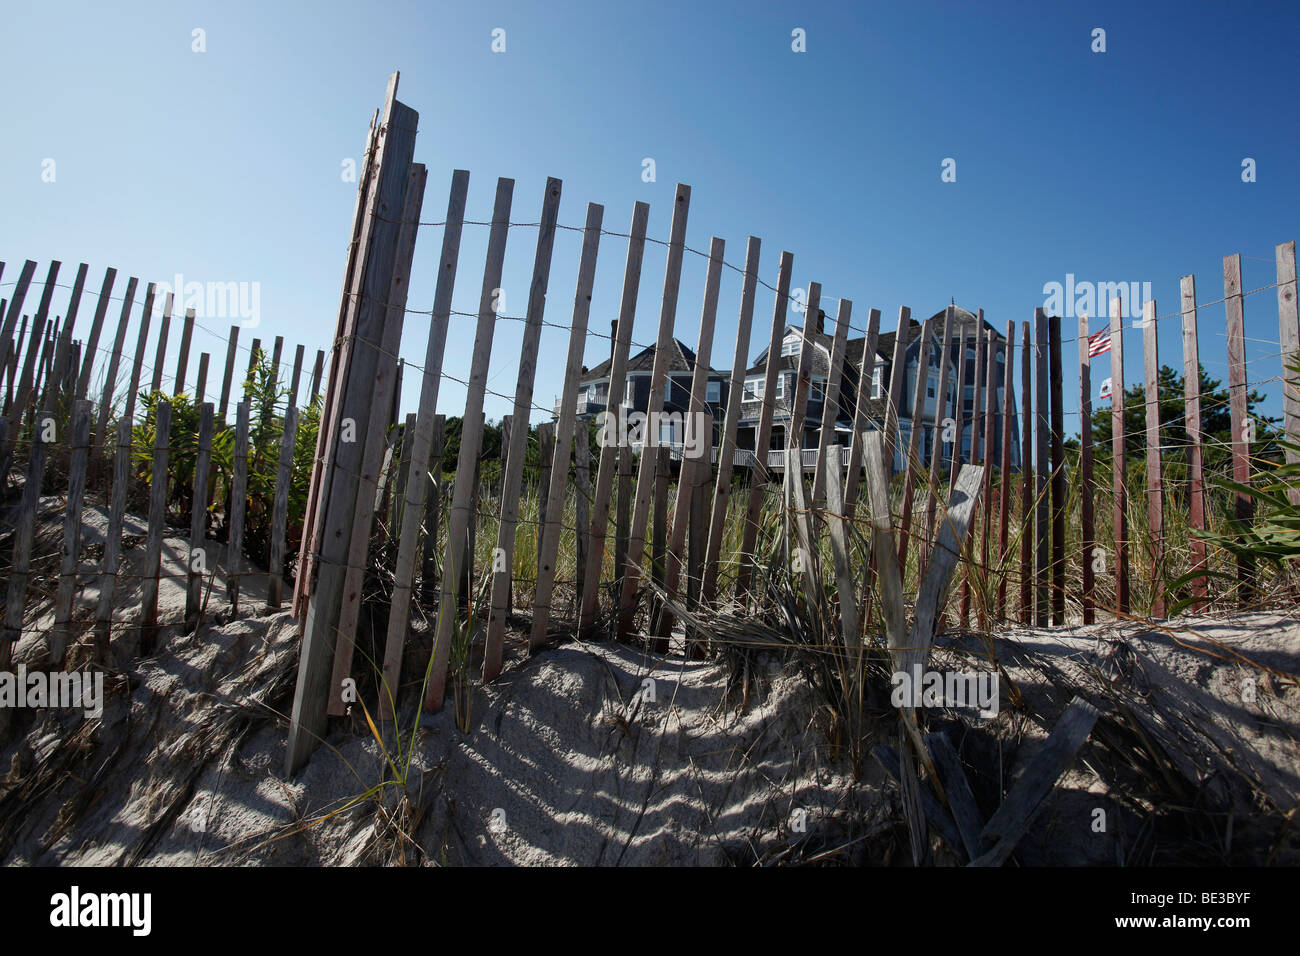 Erosion prevention beach fence, Southhampton, New York - Stock Image